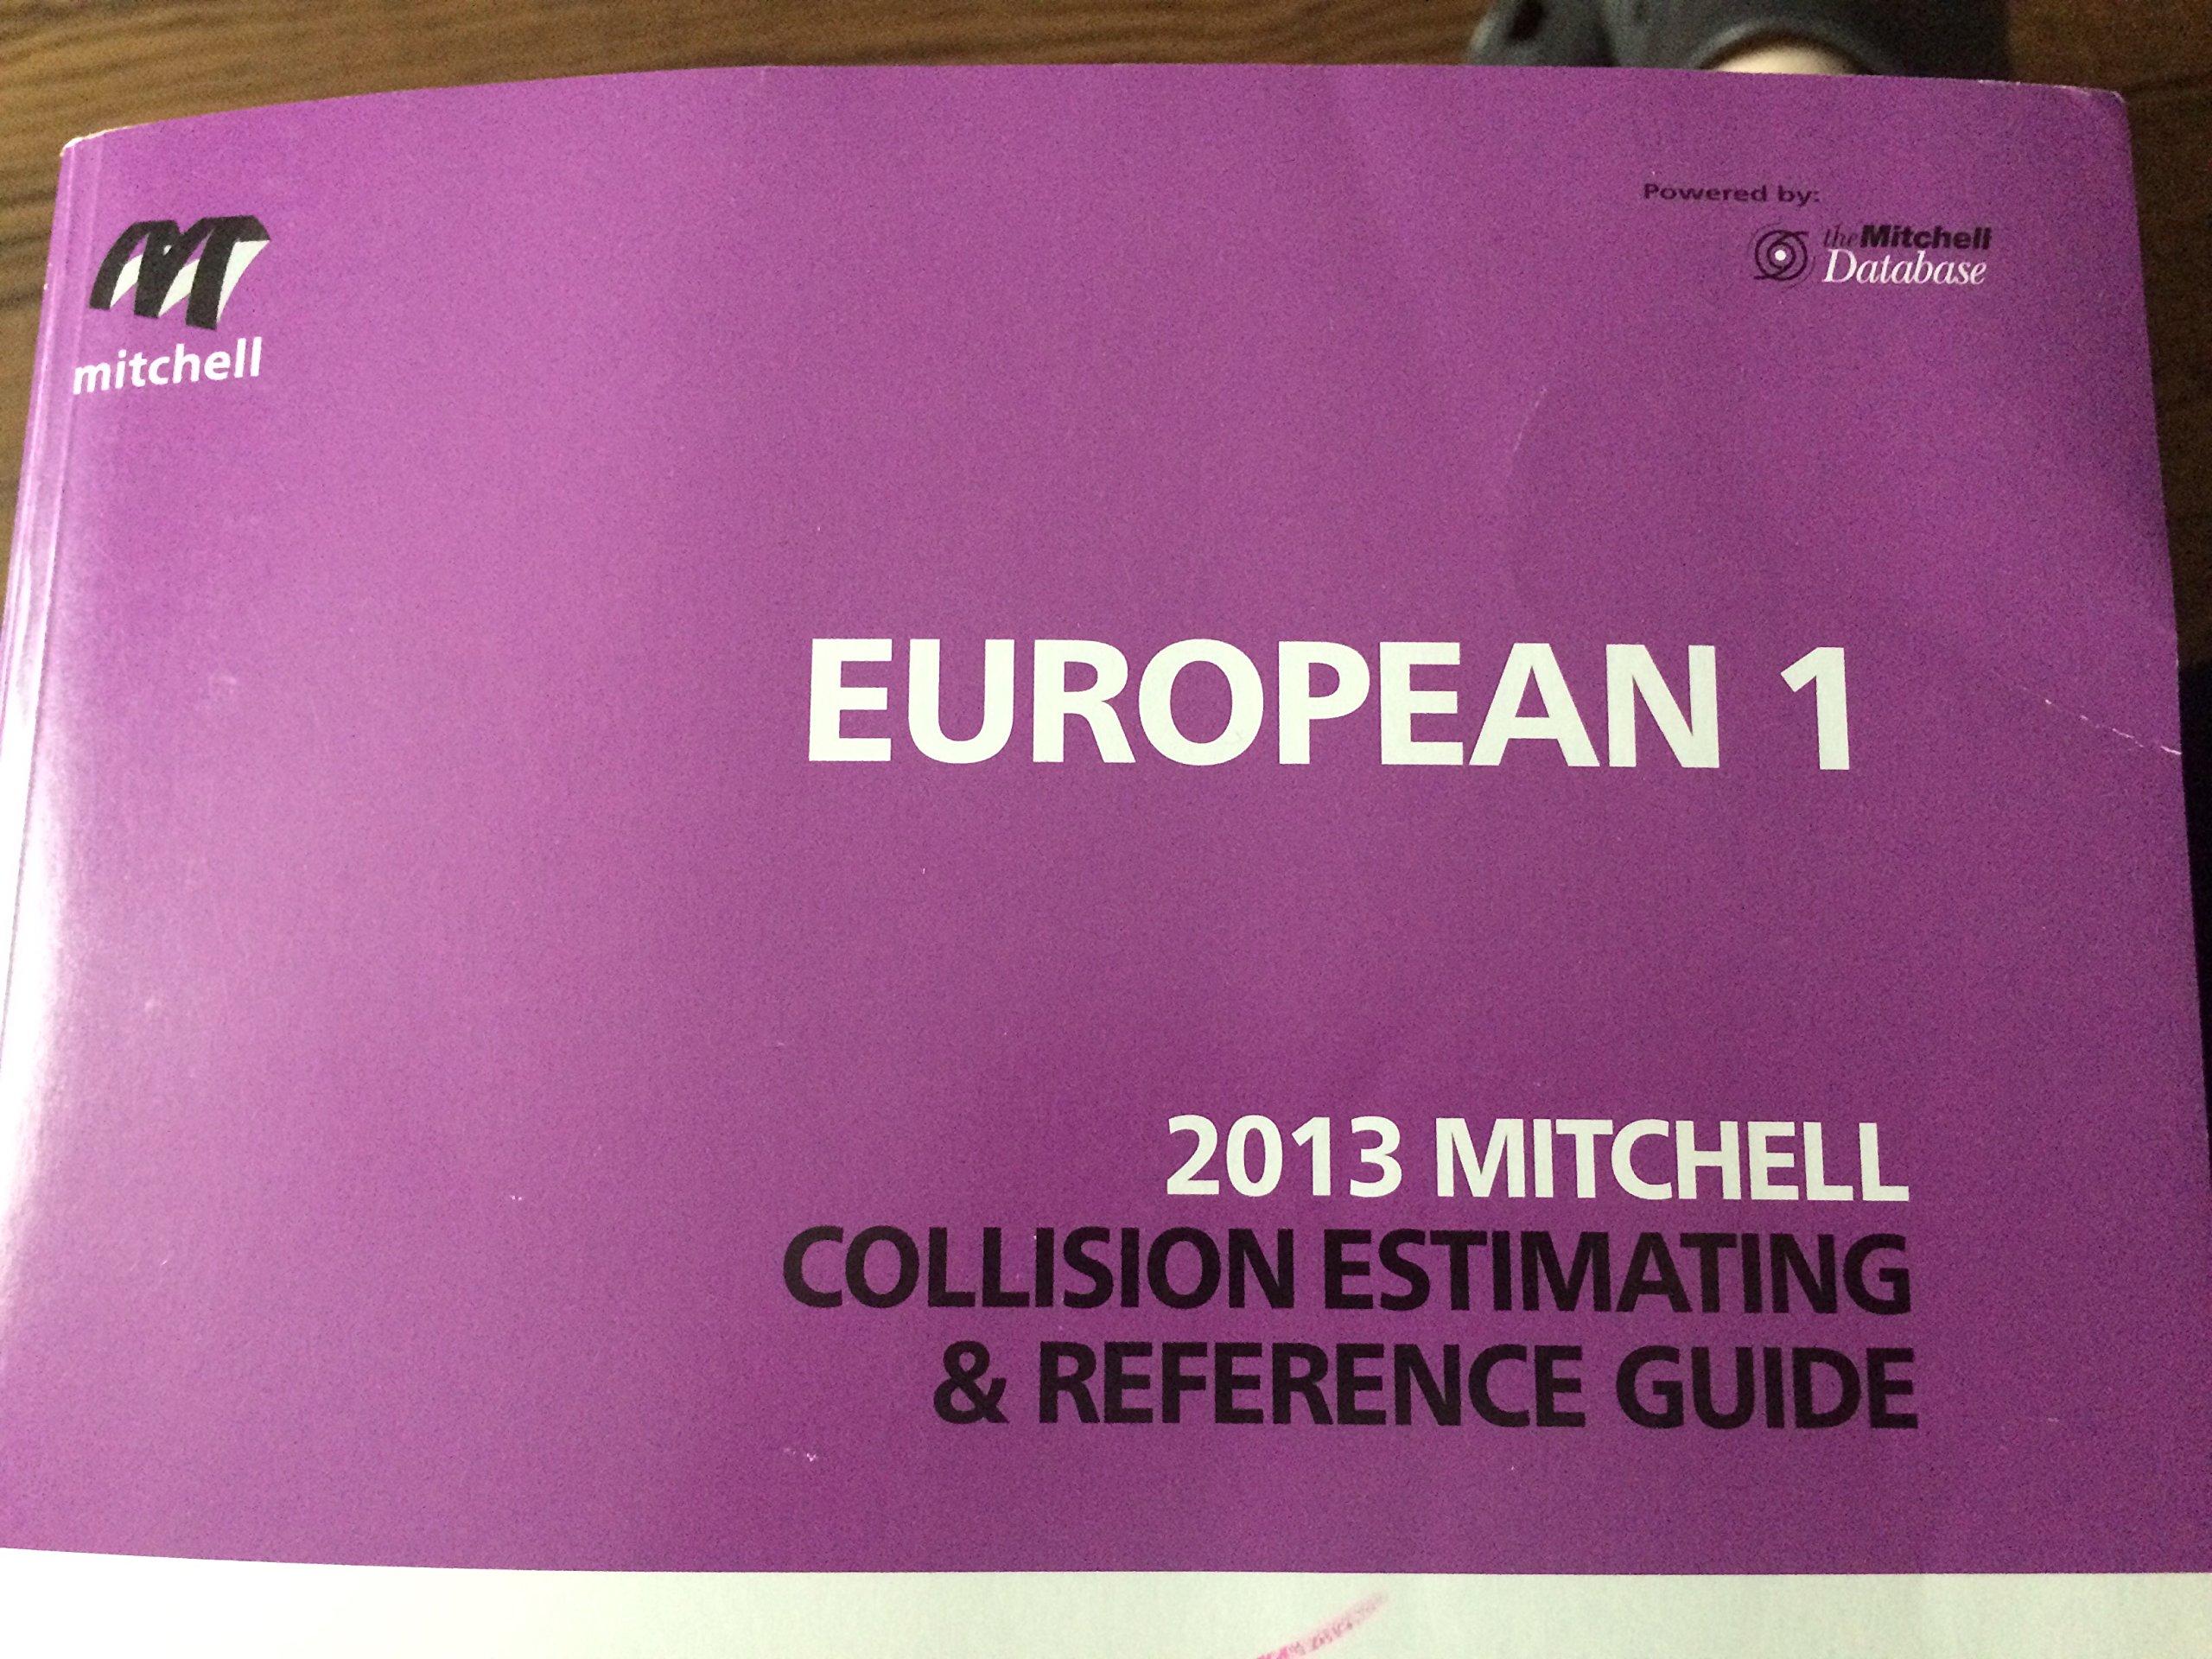 European I 2013 Mitchell Collision Estimating & Reference Guide: Mitchell  International: 9780847031337: Amazon.com: Books